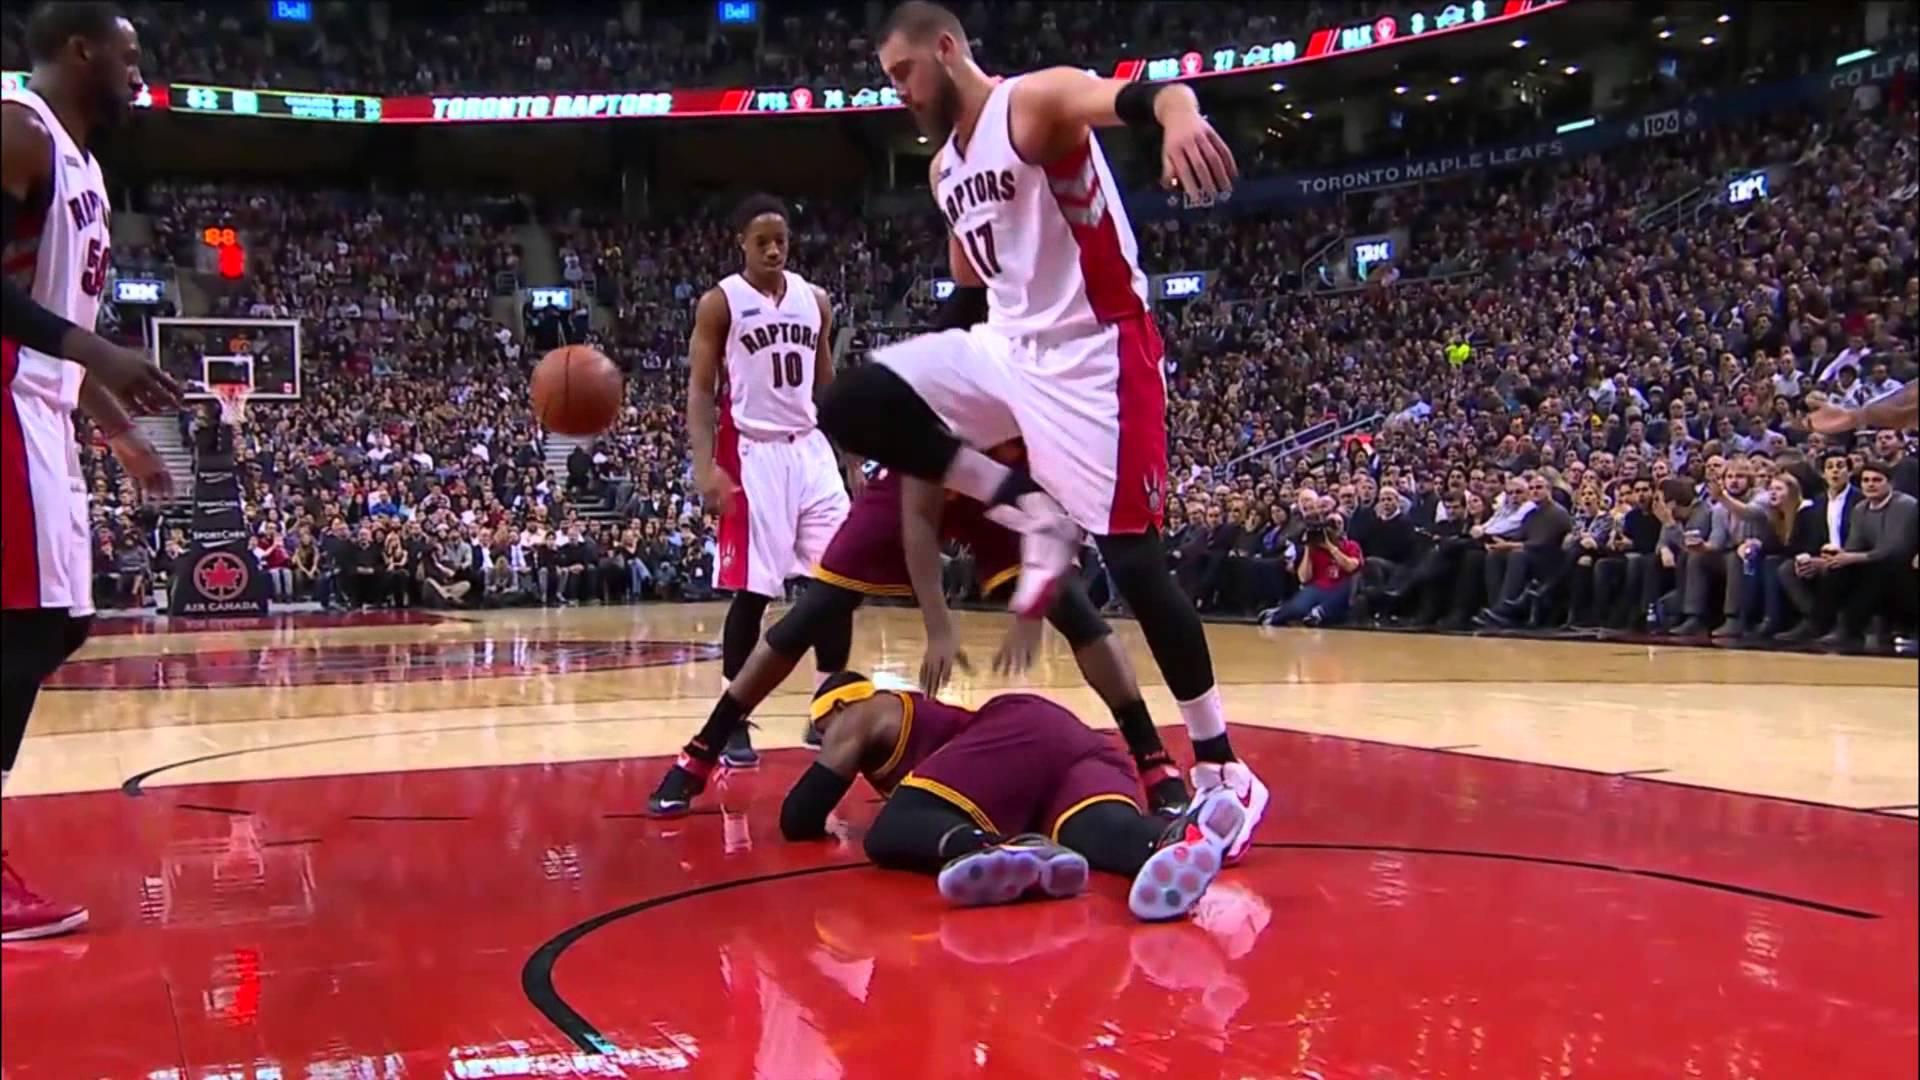 LeBron James swipes at Jonas Valanciunas after being flagrantly fouled